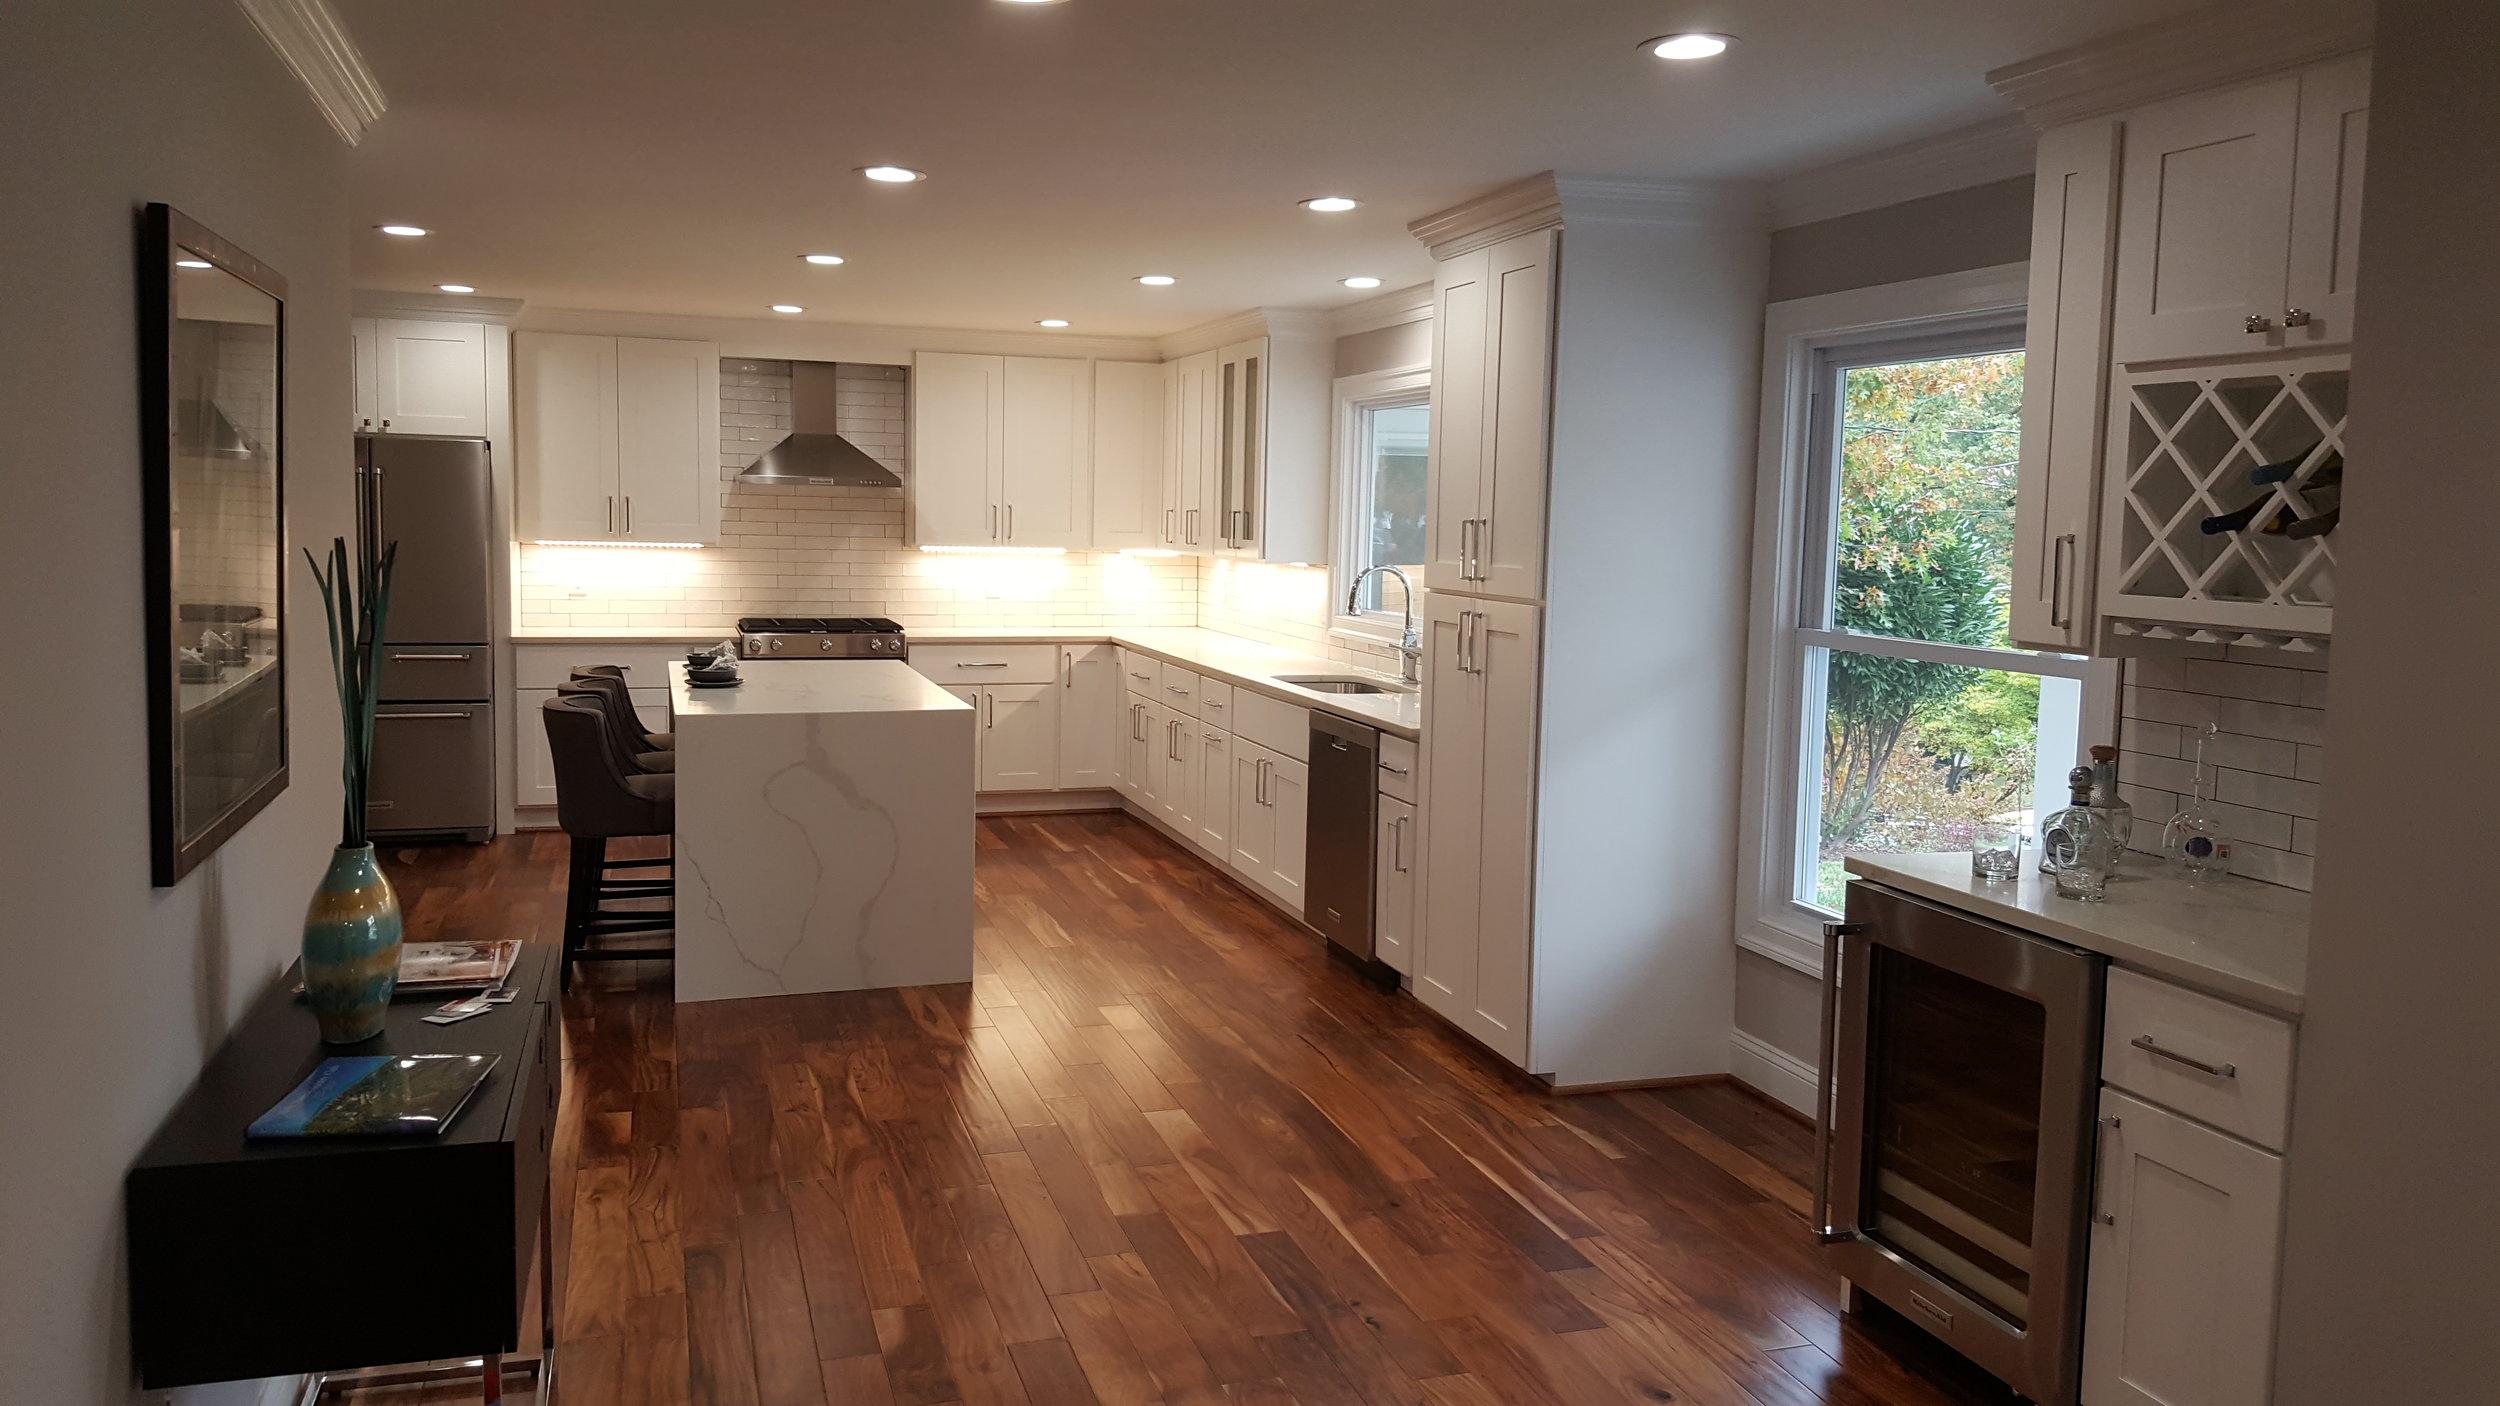 Alexandria Home Remodel Calabrese Home Improvement